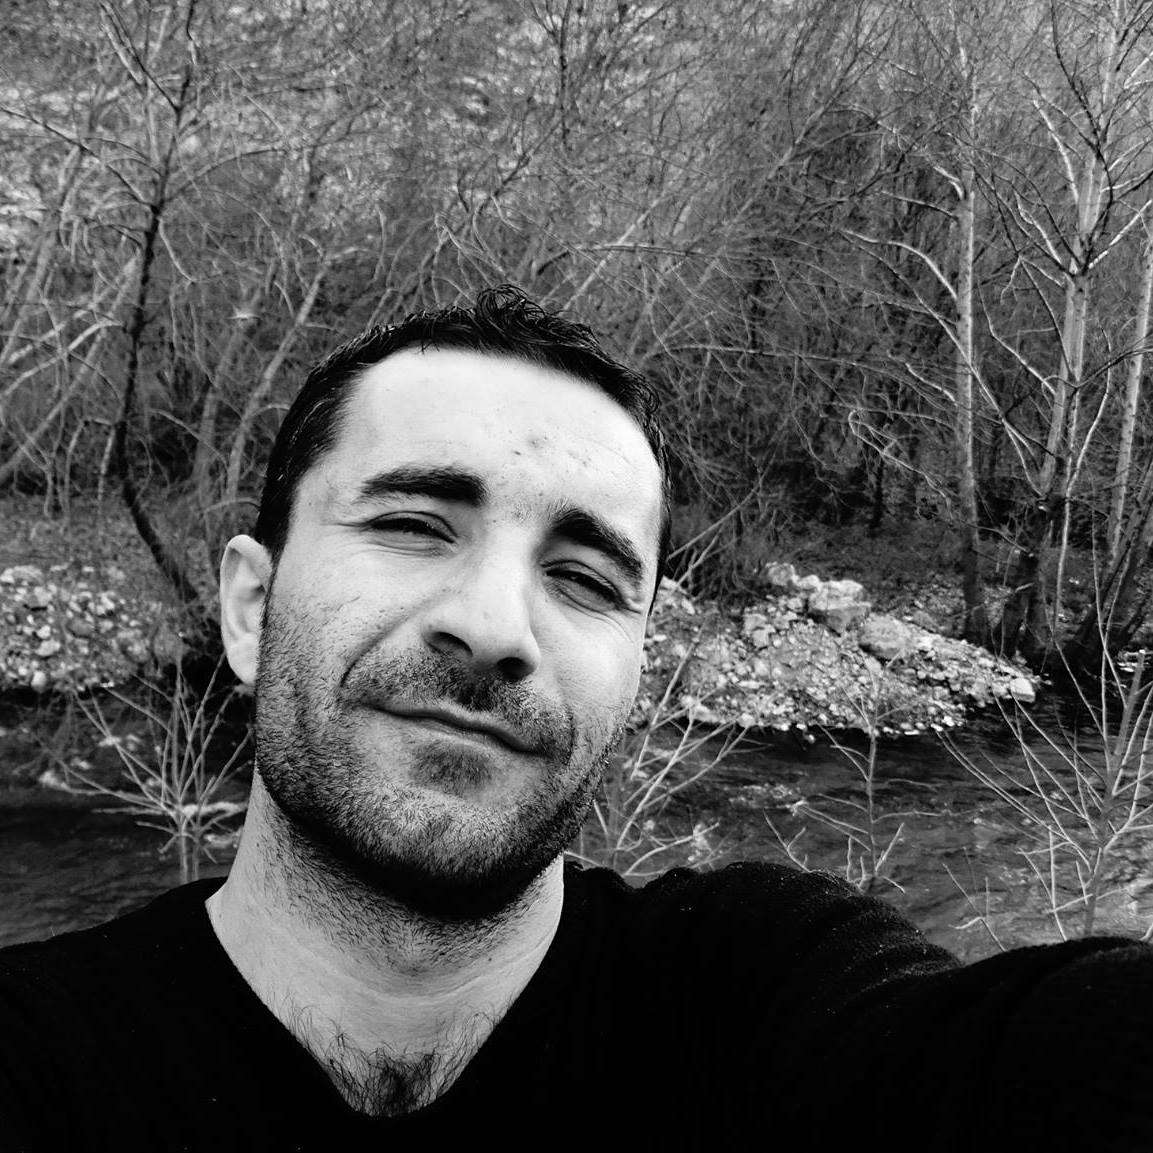 سلطان الجلبي - صحافي سوري